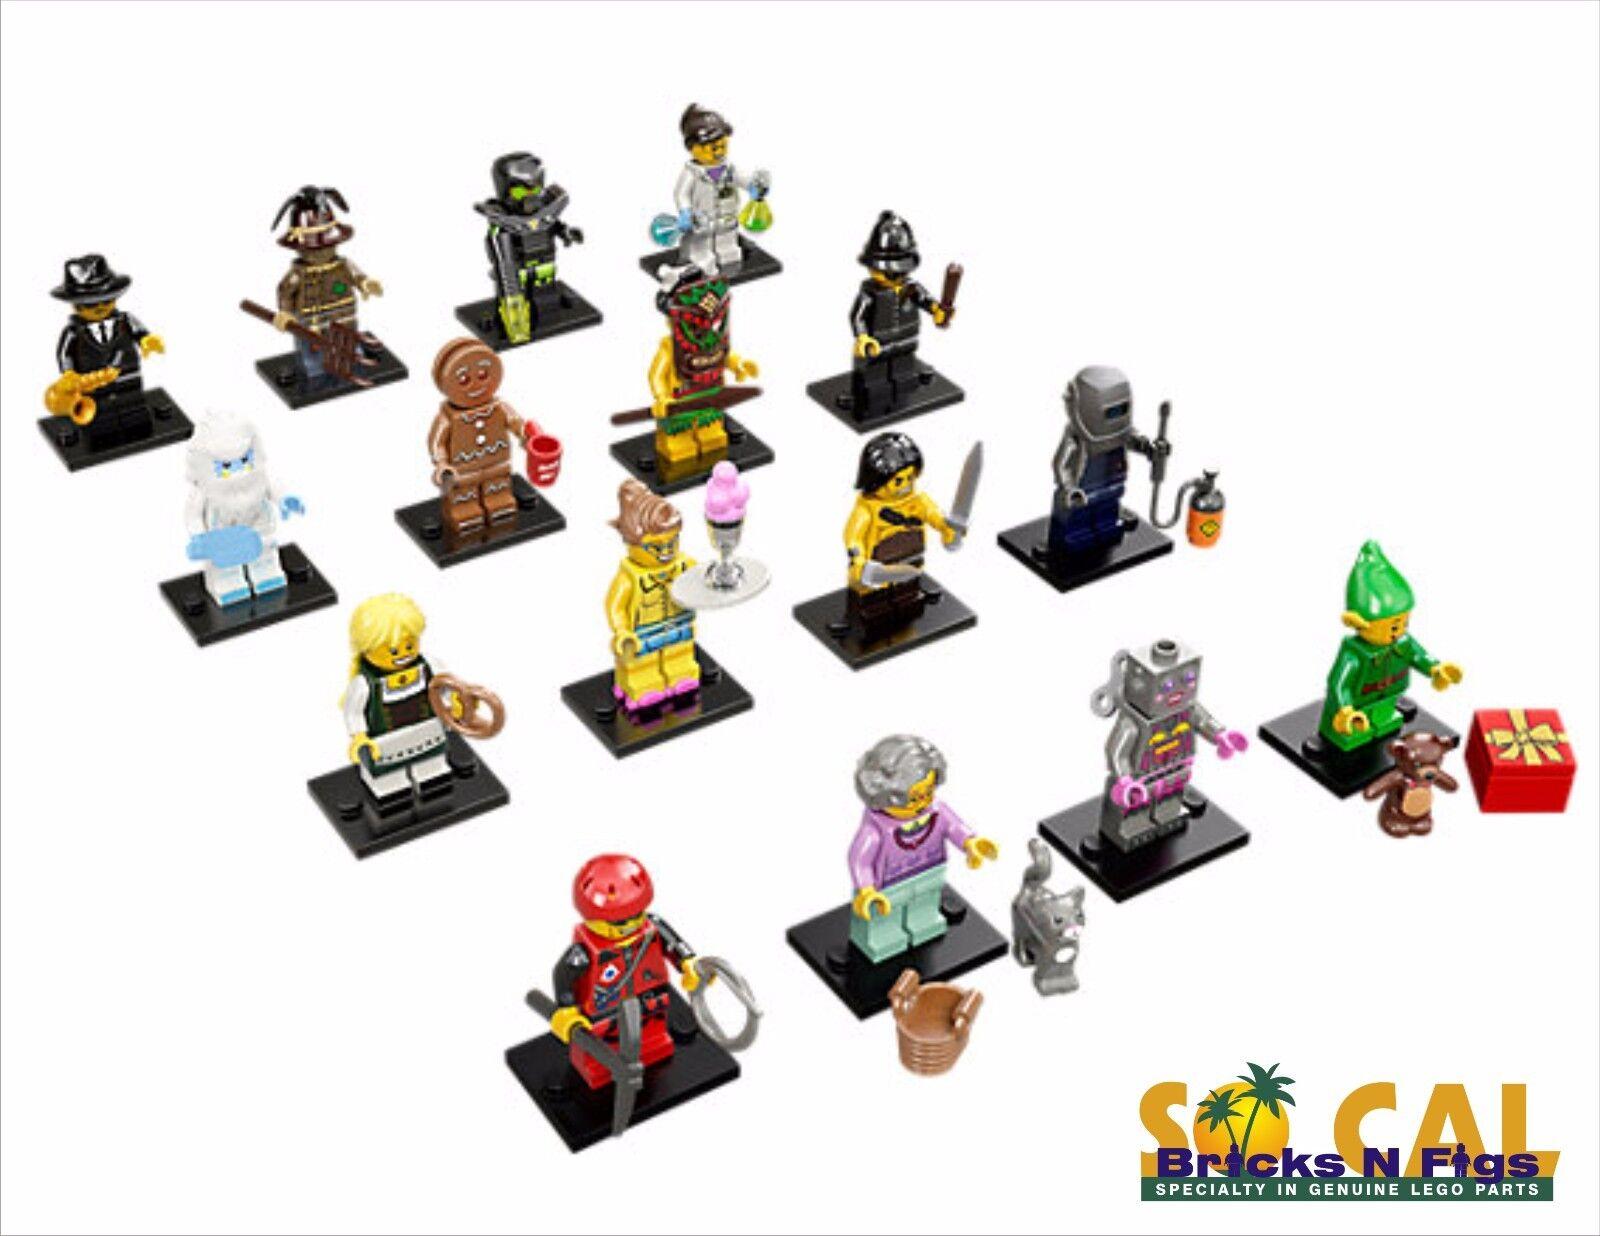 New LEGO 71002 Complete Set of 16 16 16 Minifigures Series 11 de940f